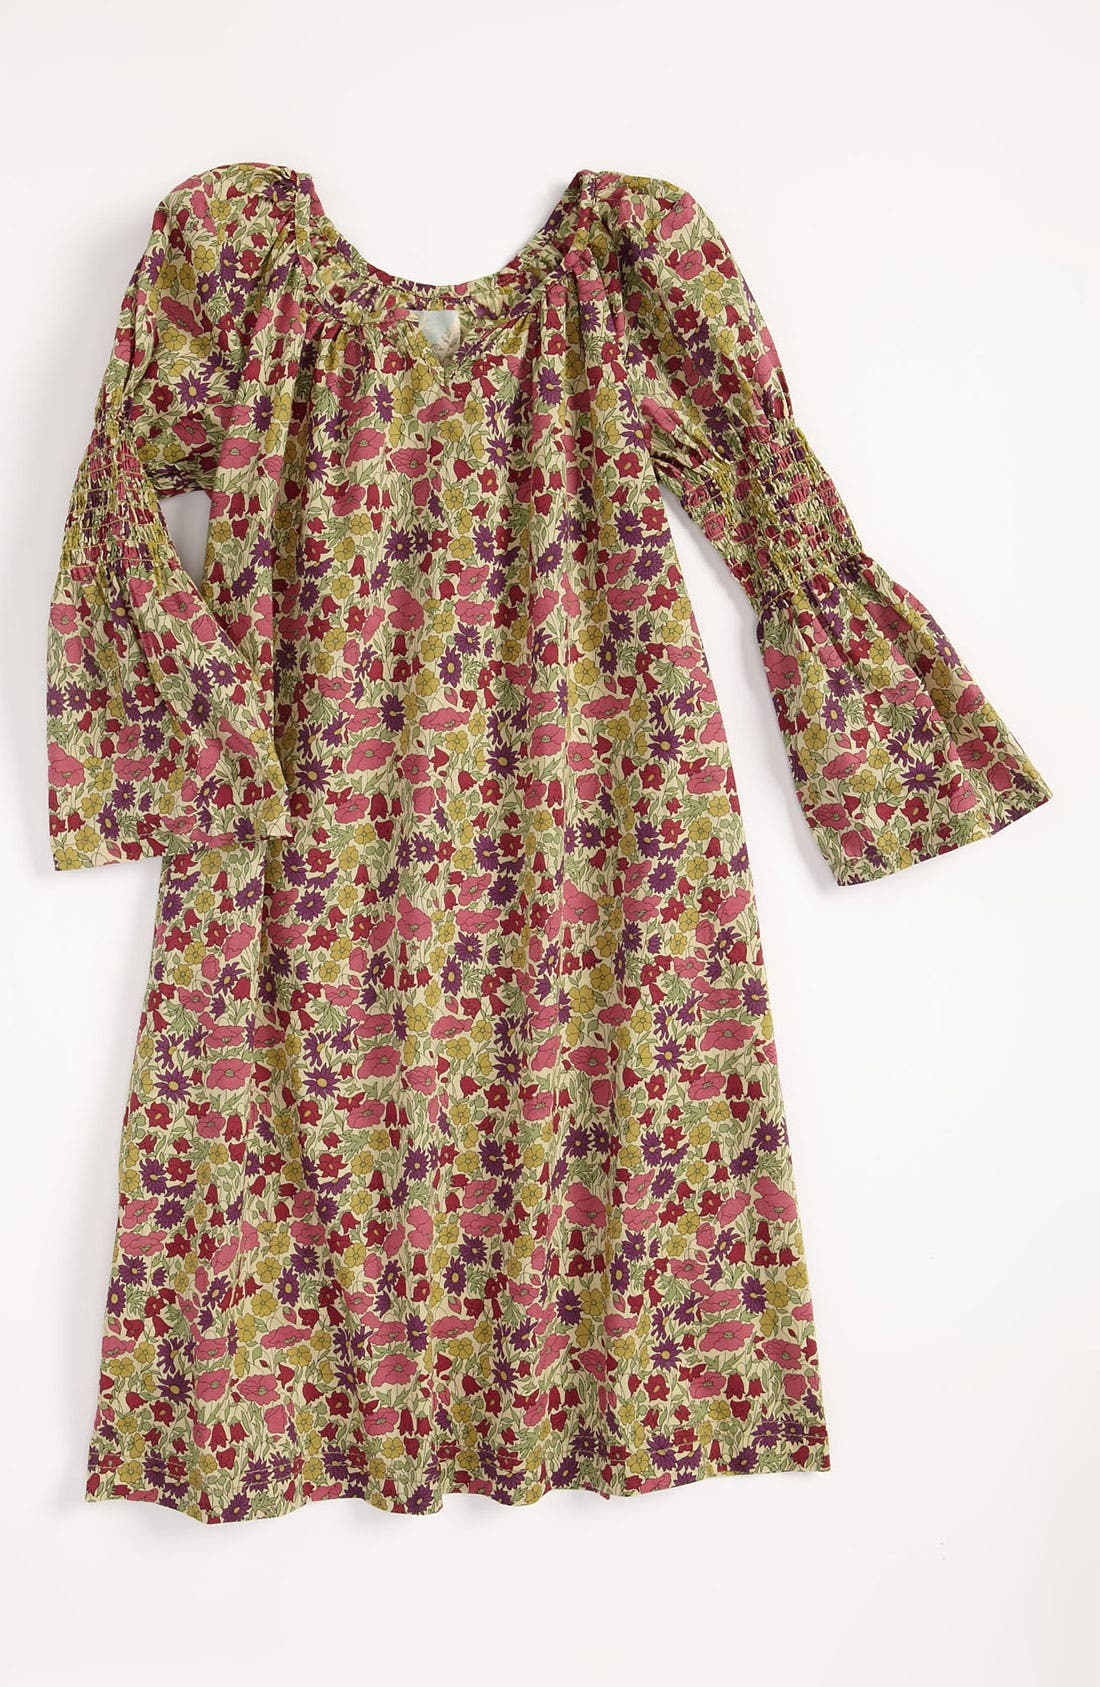 Main Image - Peek 'Blanche' Dress (Toddler, Little Girls & Big Girls)